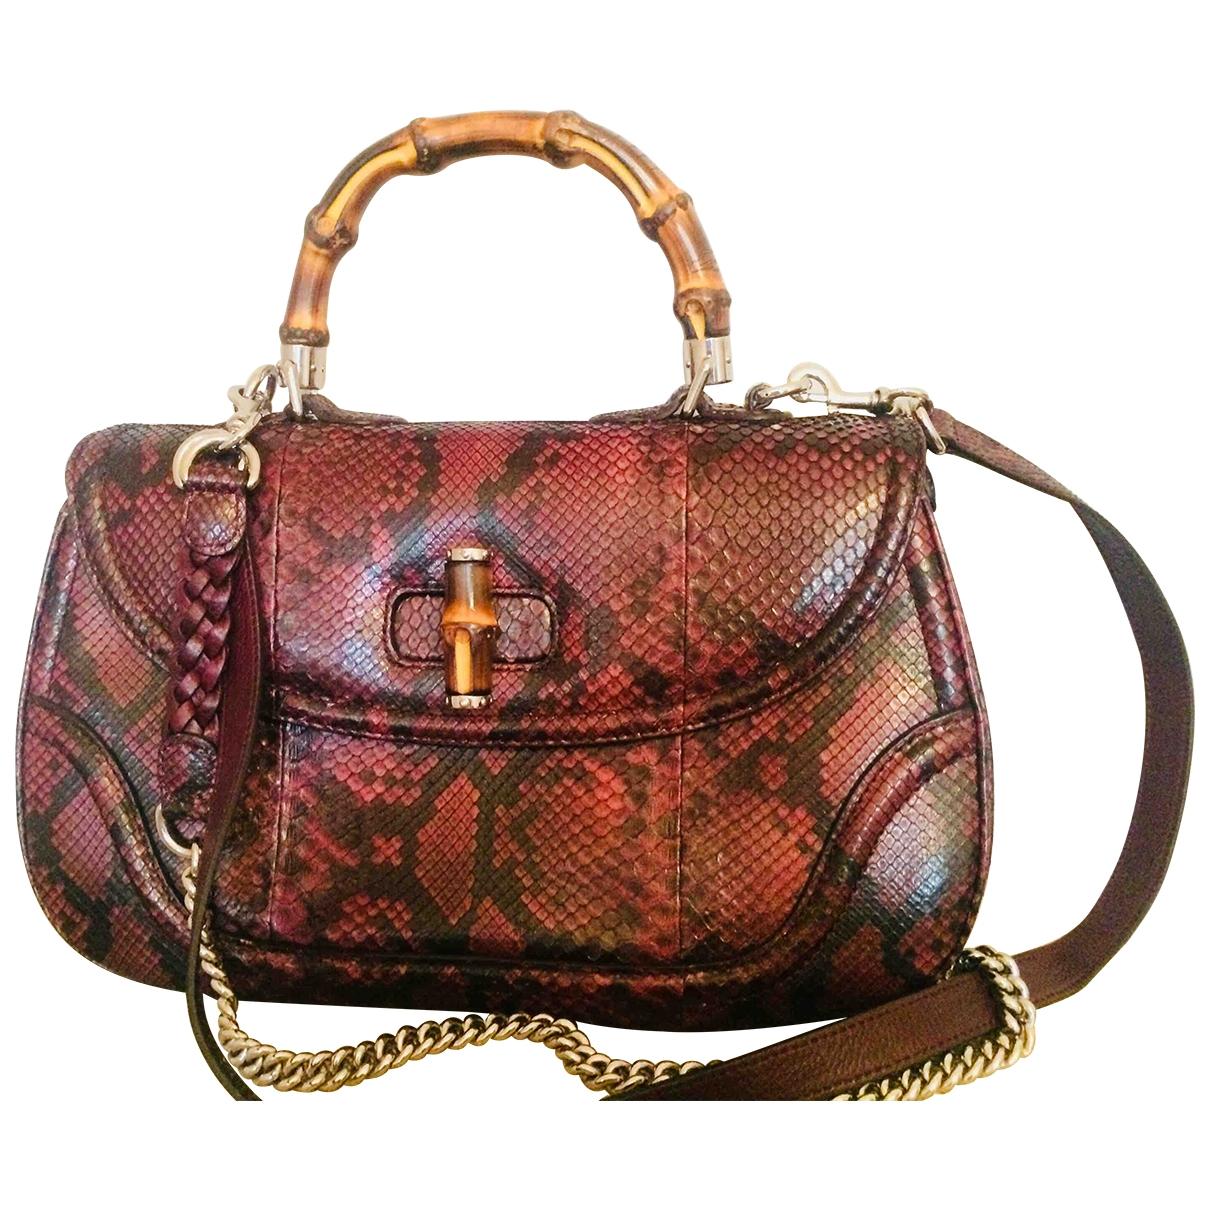 Gucci Bamboo Handtasche in  Bordeauxrot Python